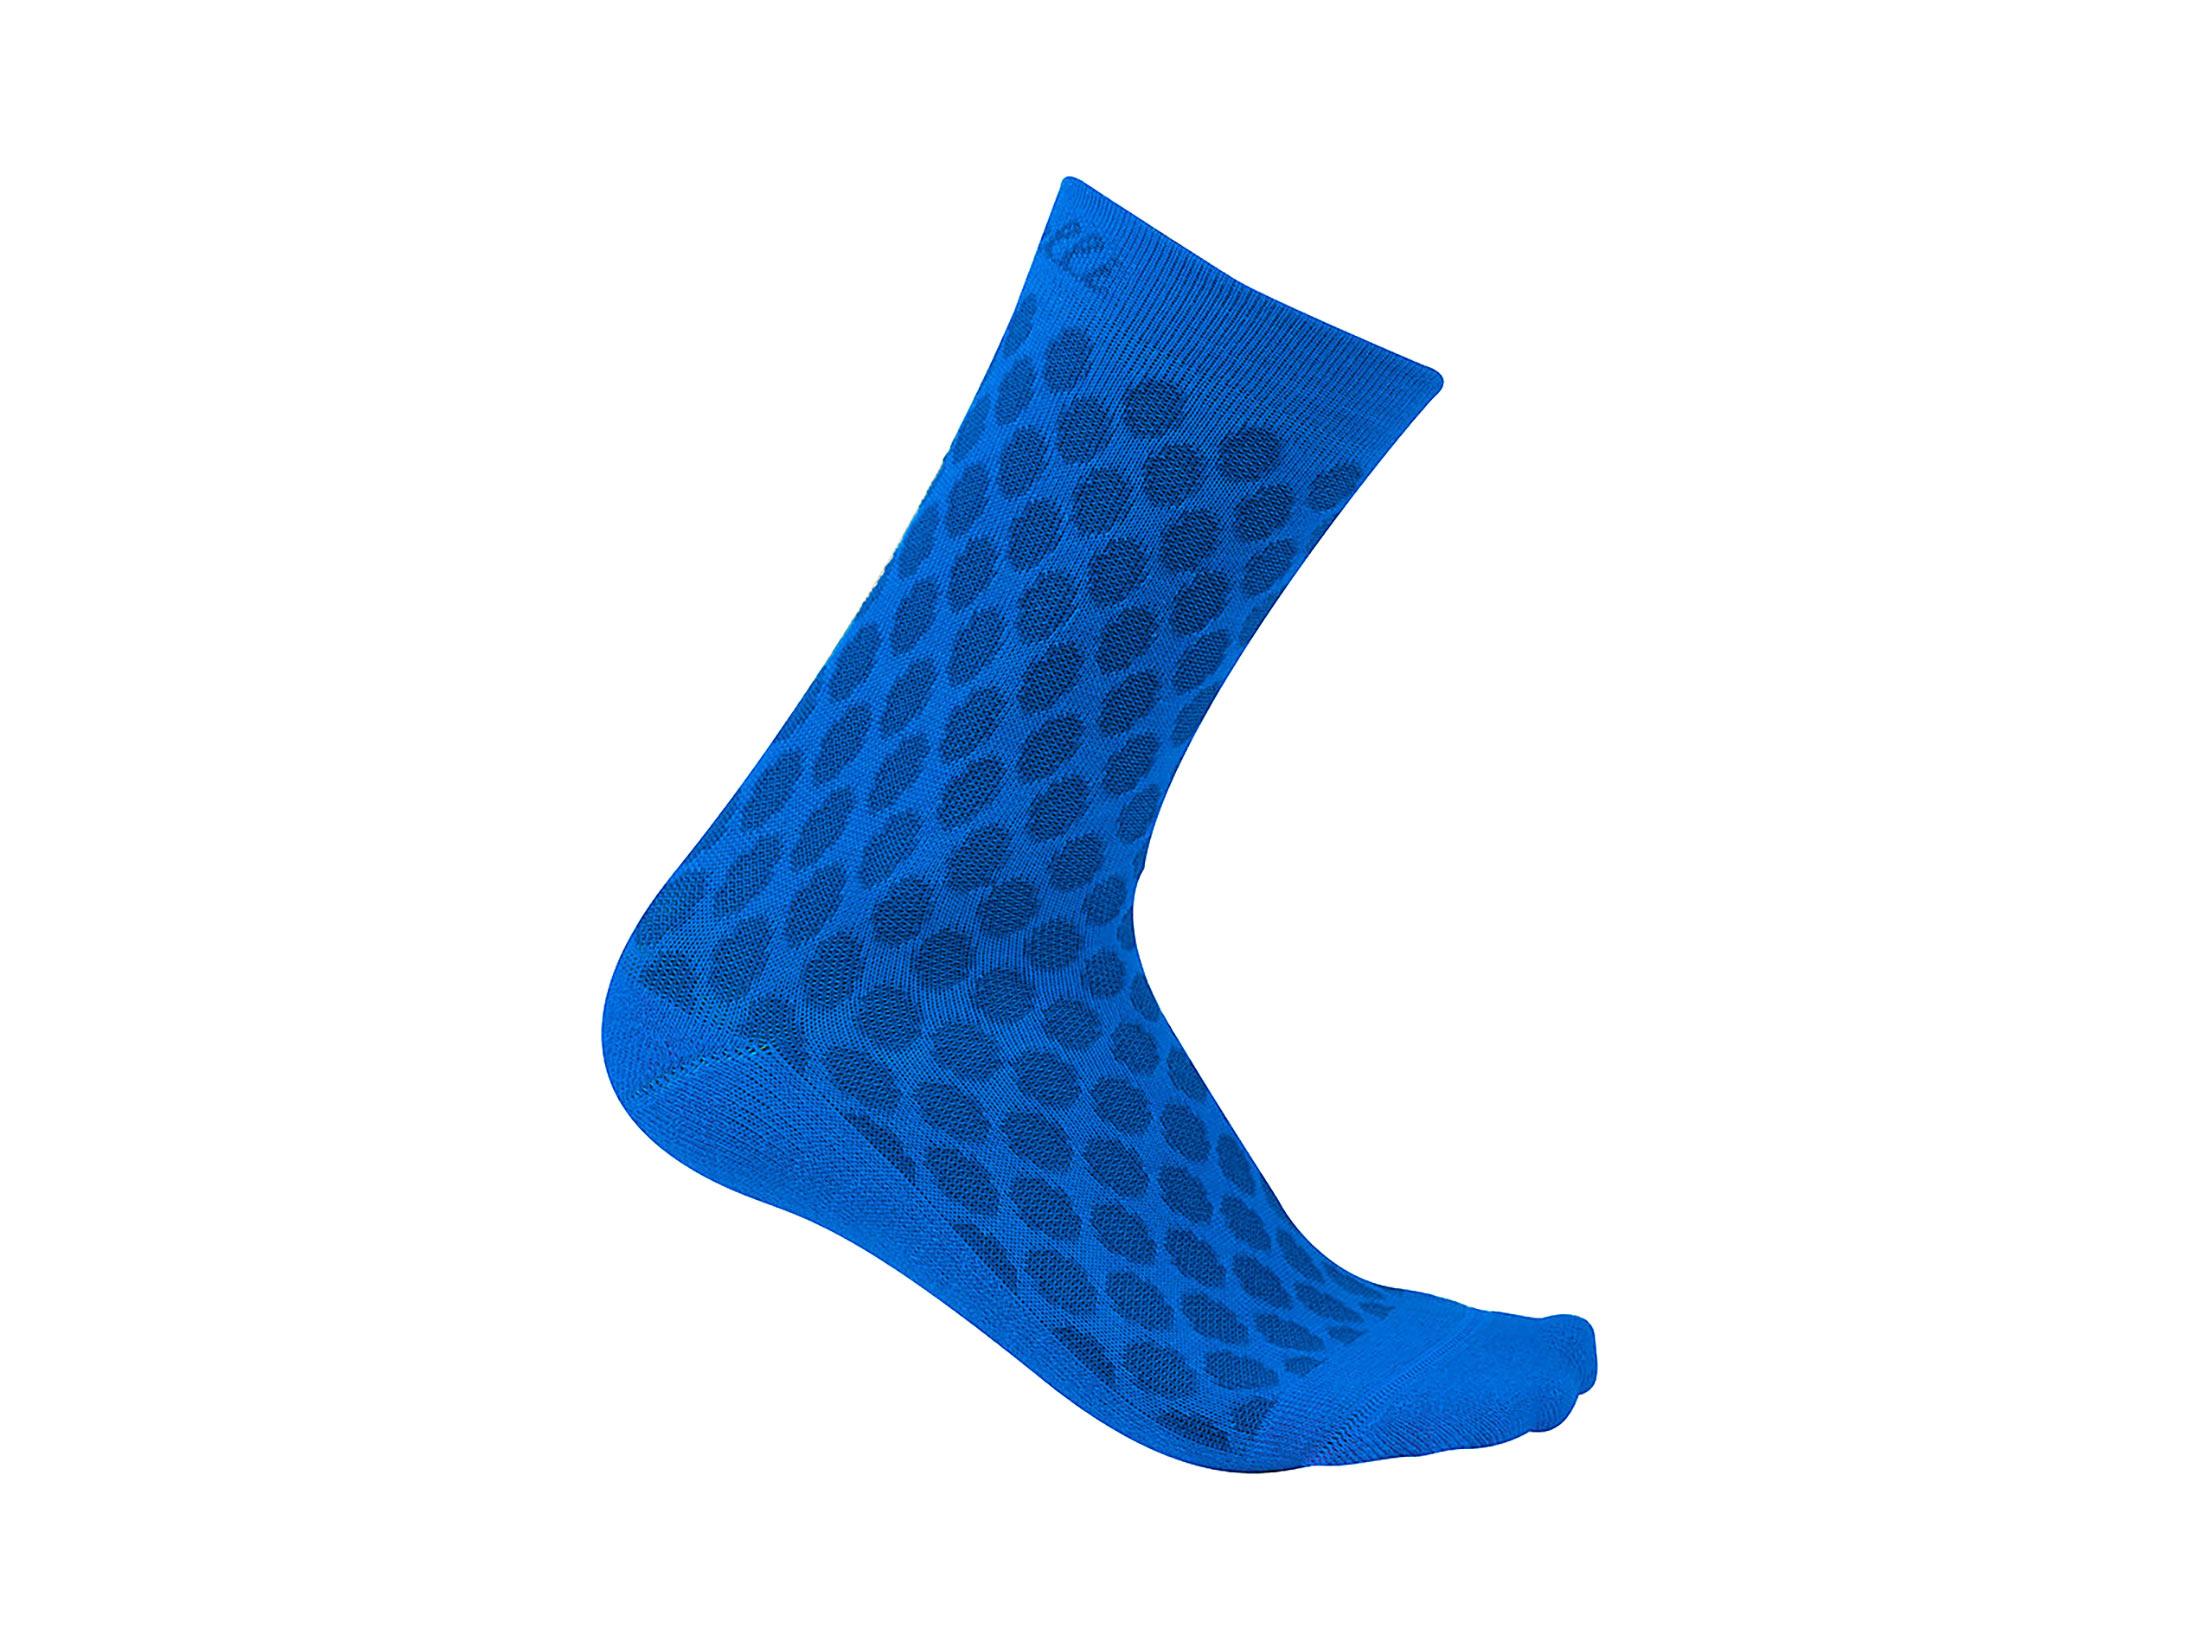 Castelli Ruota 13 Cycling Socks